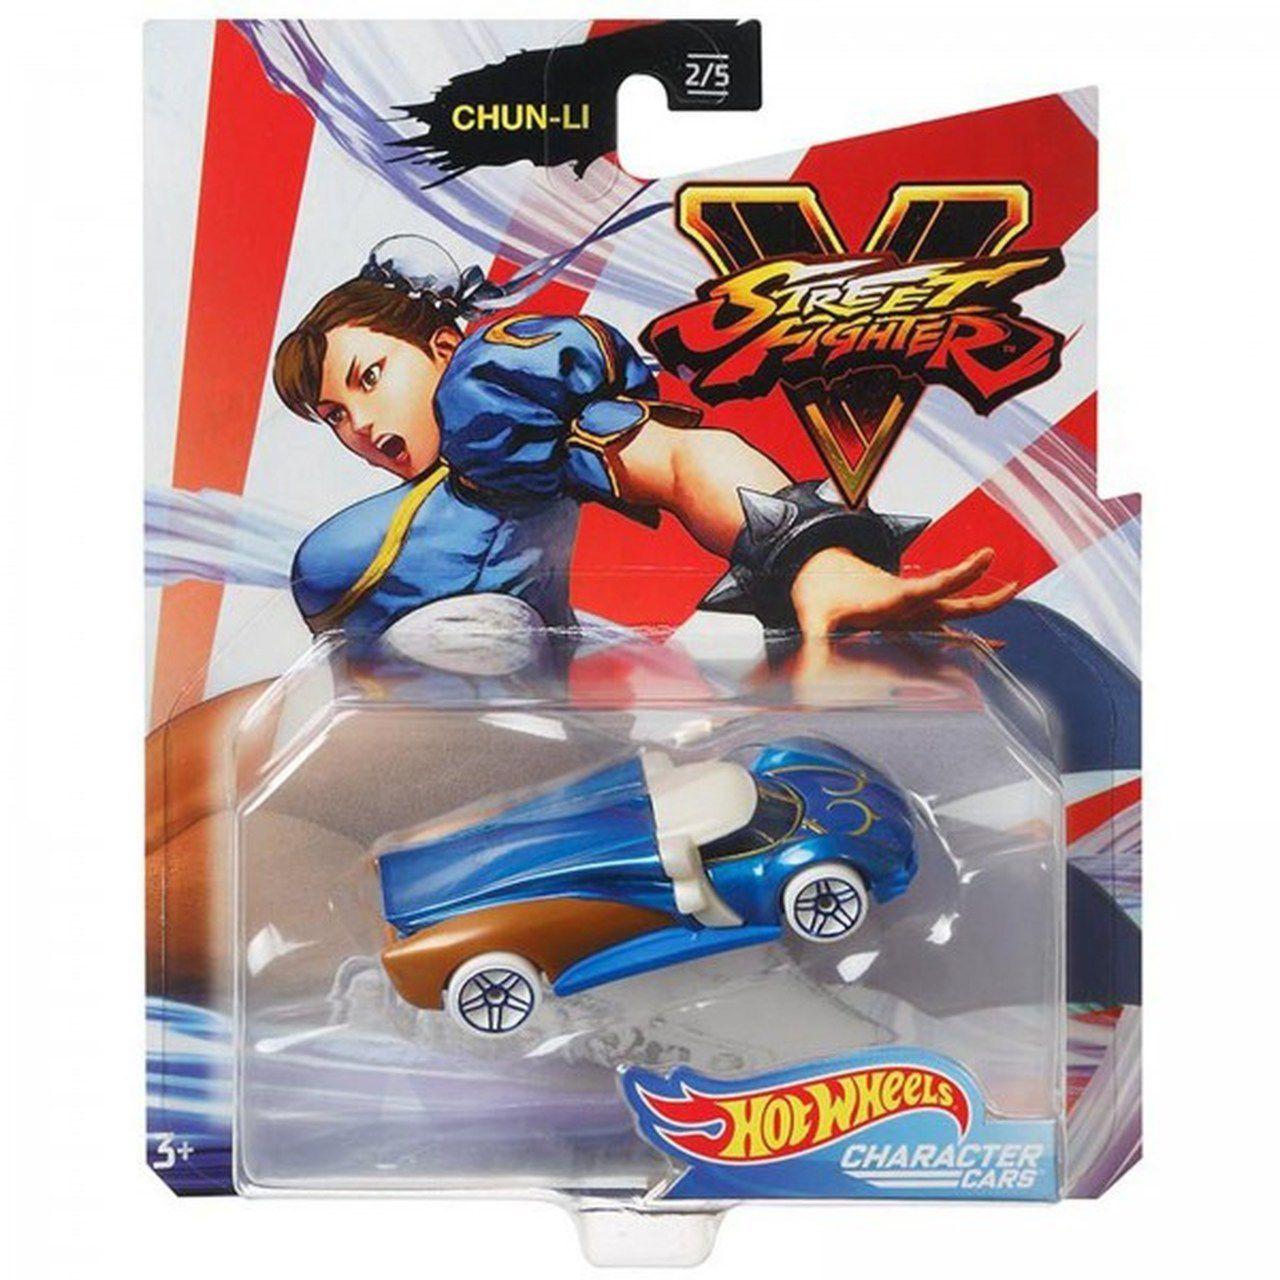 Carrinho Chun-Li: Street Fighter V - Hot Wheels